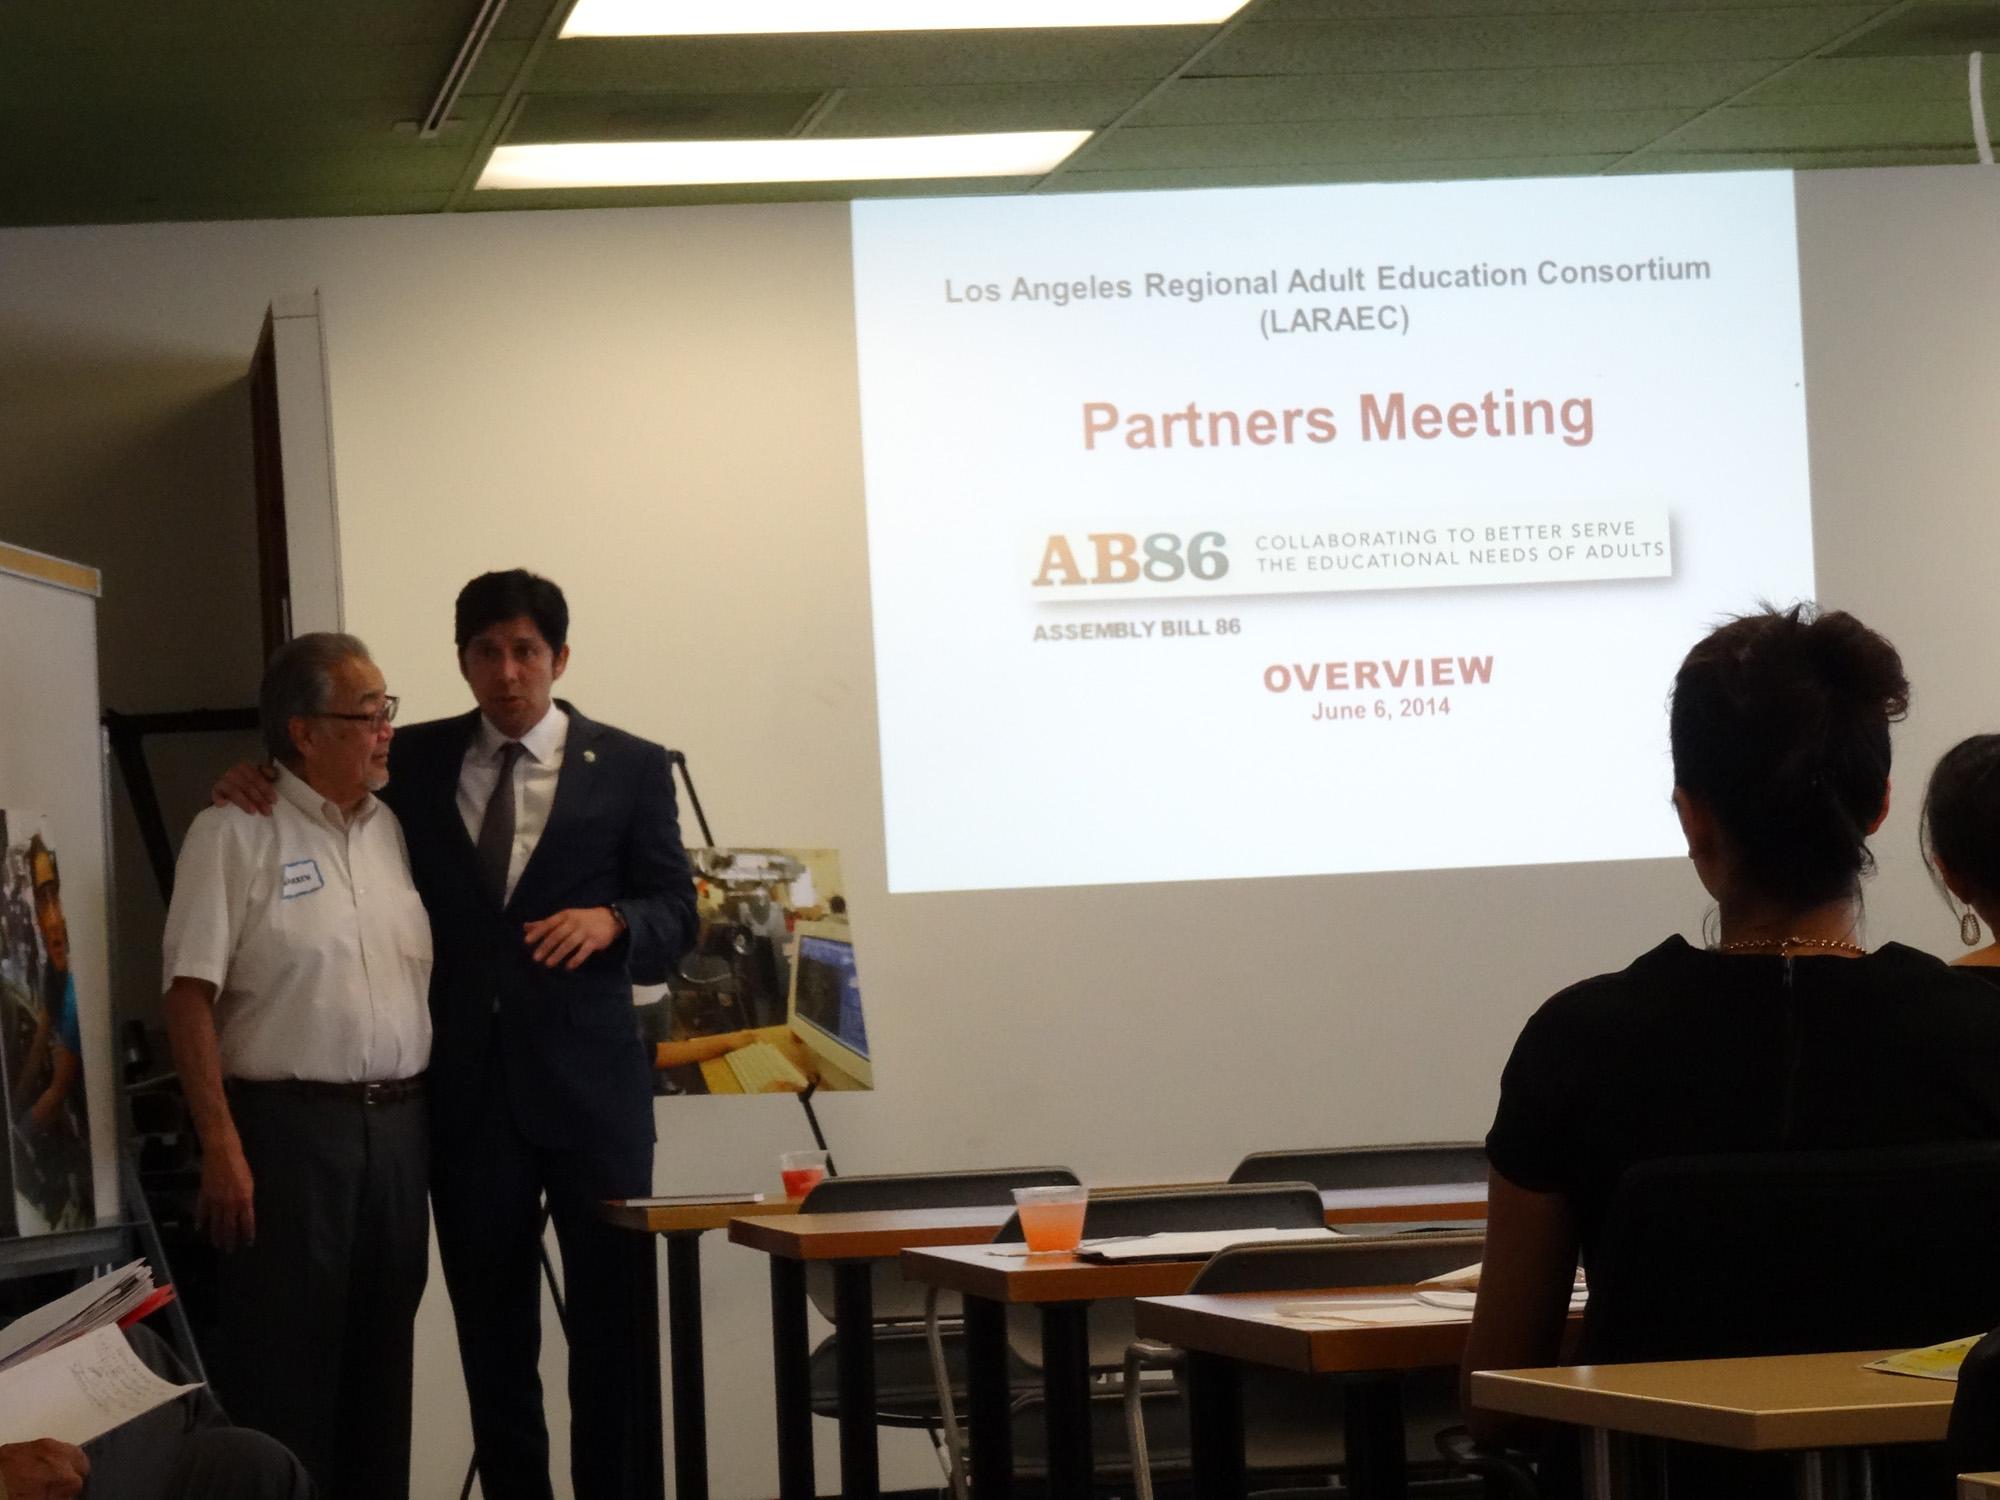 LARAEC-Partners-Meeting-06-06-14-16